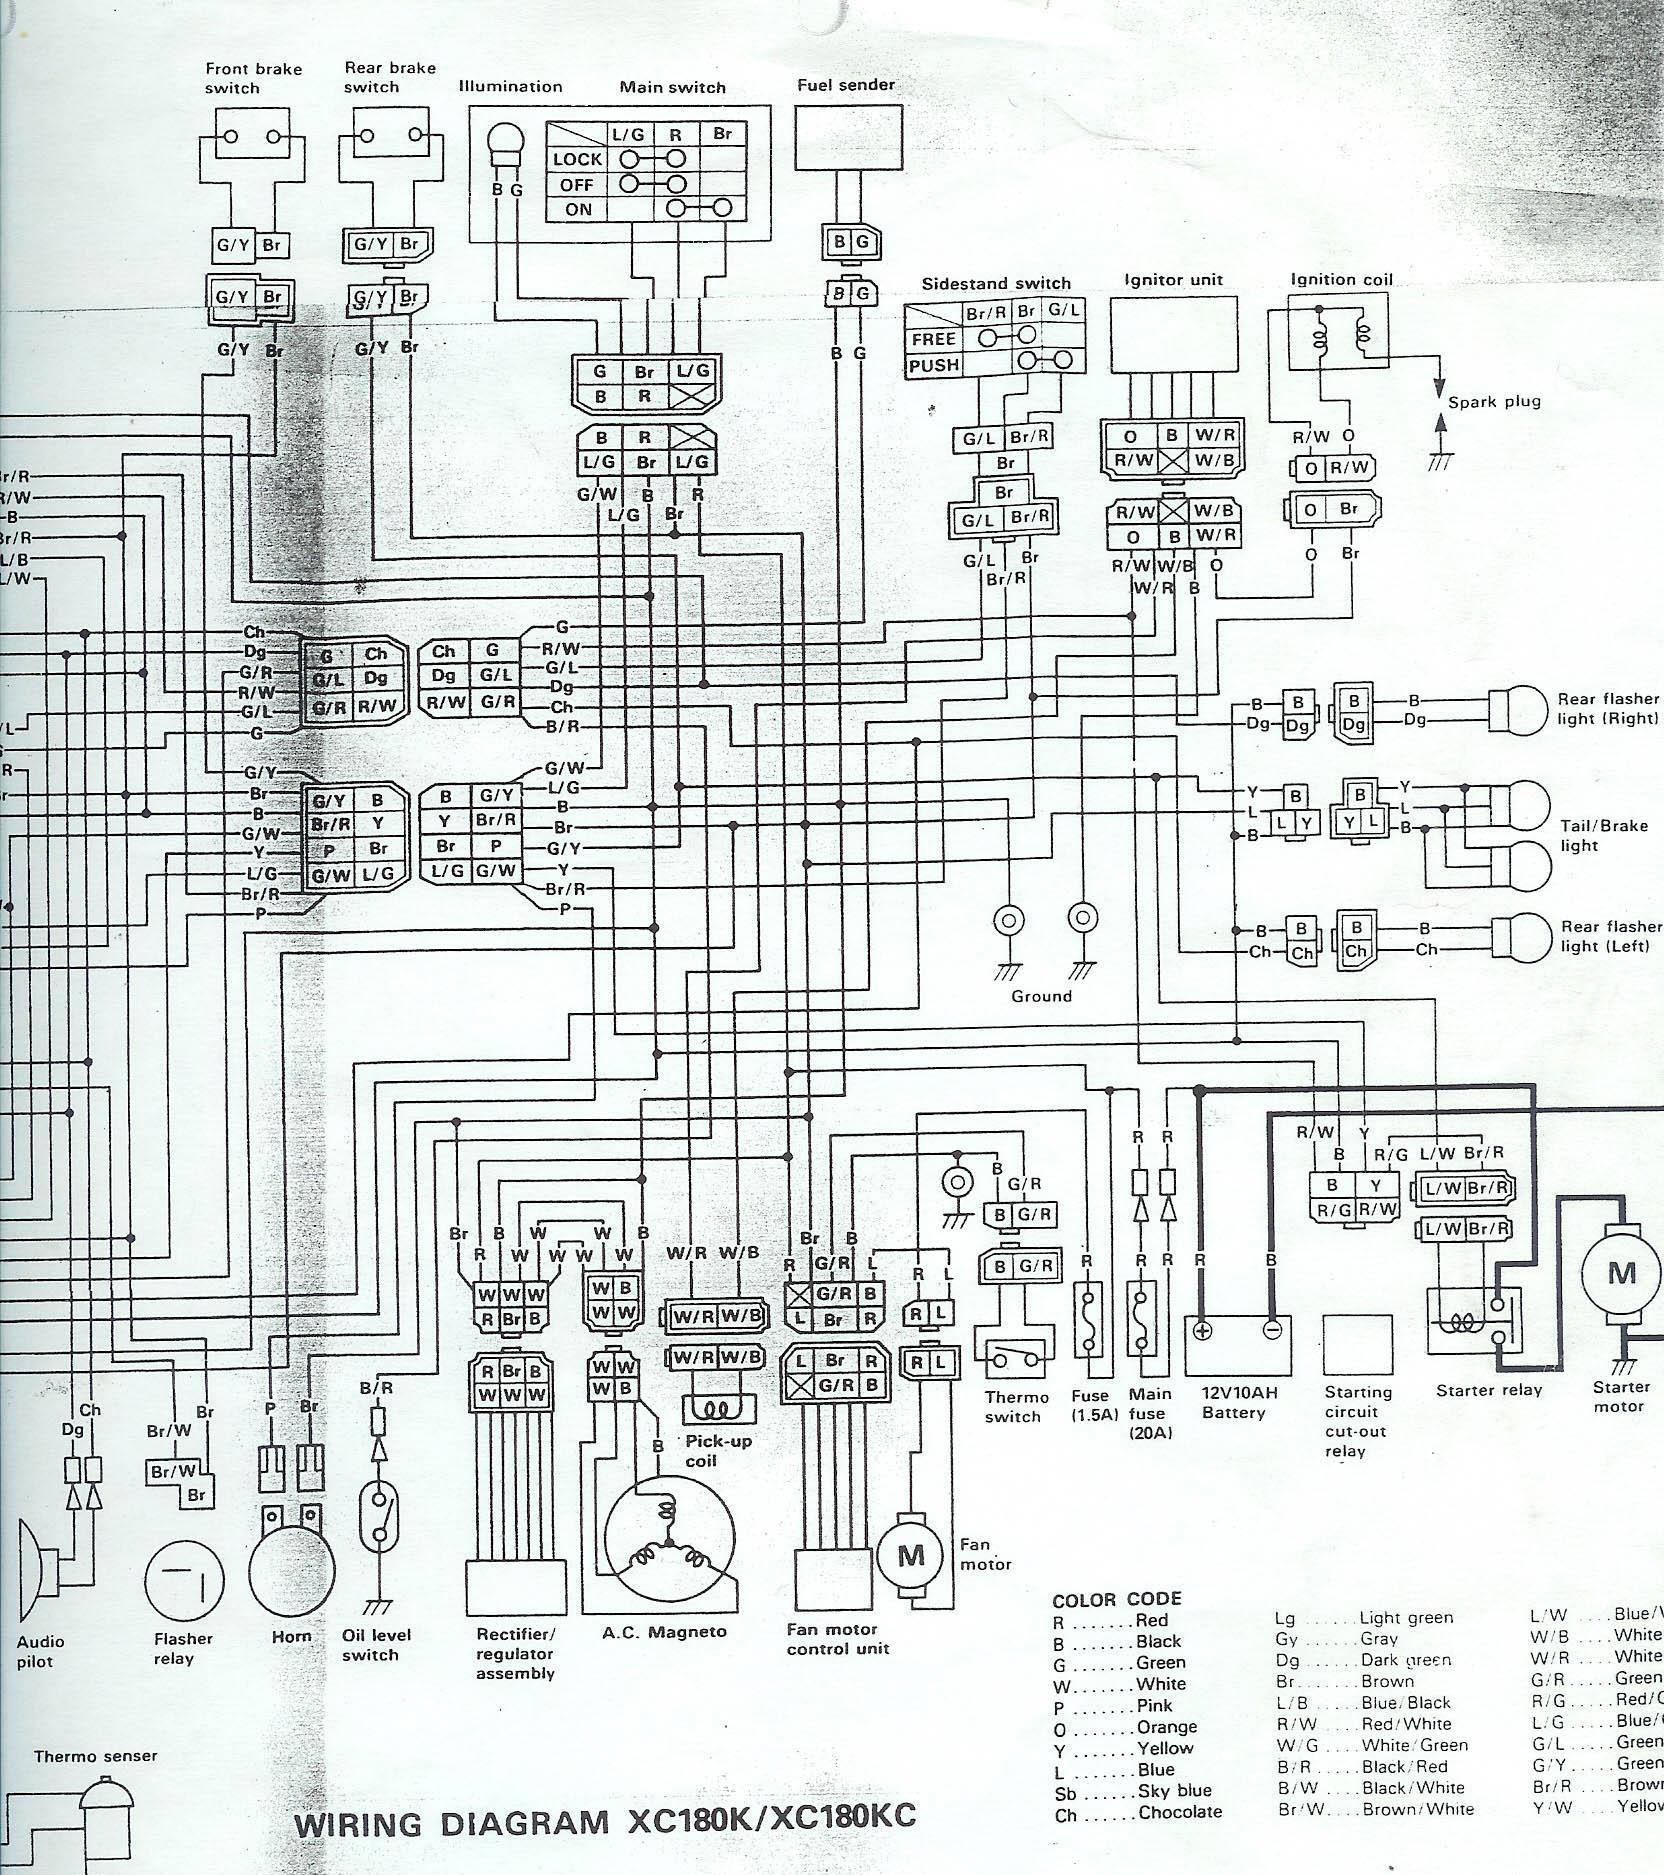 XC180_wiring_diagram_2?resize\=665%2C749 ditra heat 240v wiring diagram wire diagram, gfci outlet wb wiring diagram at aneh.co